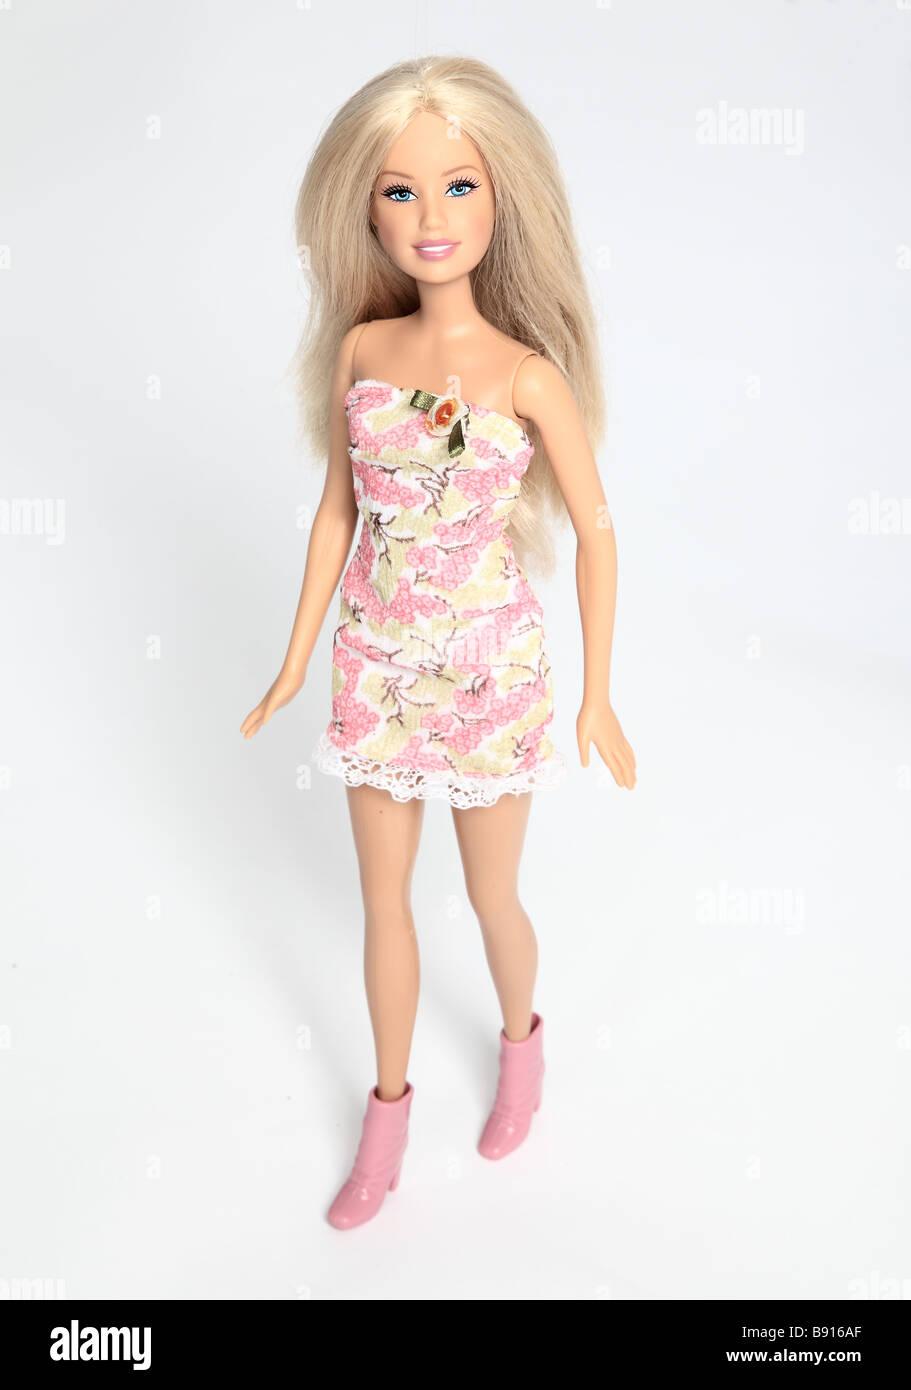 Barbie-Puppe trägt ein rosa Kleid. Stockbild